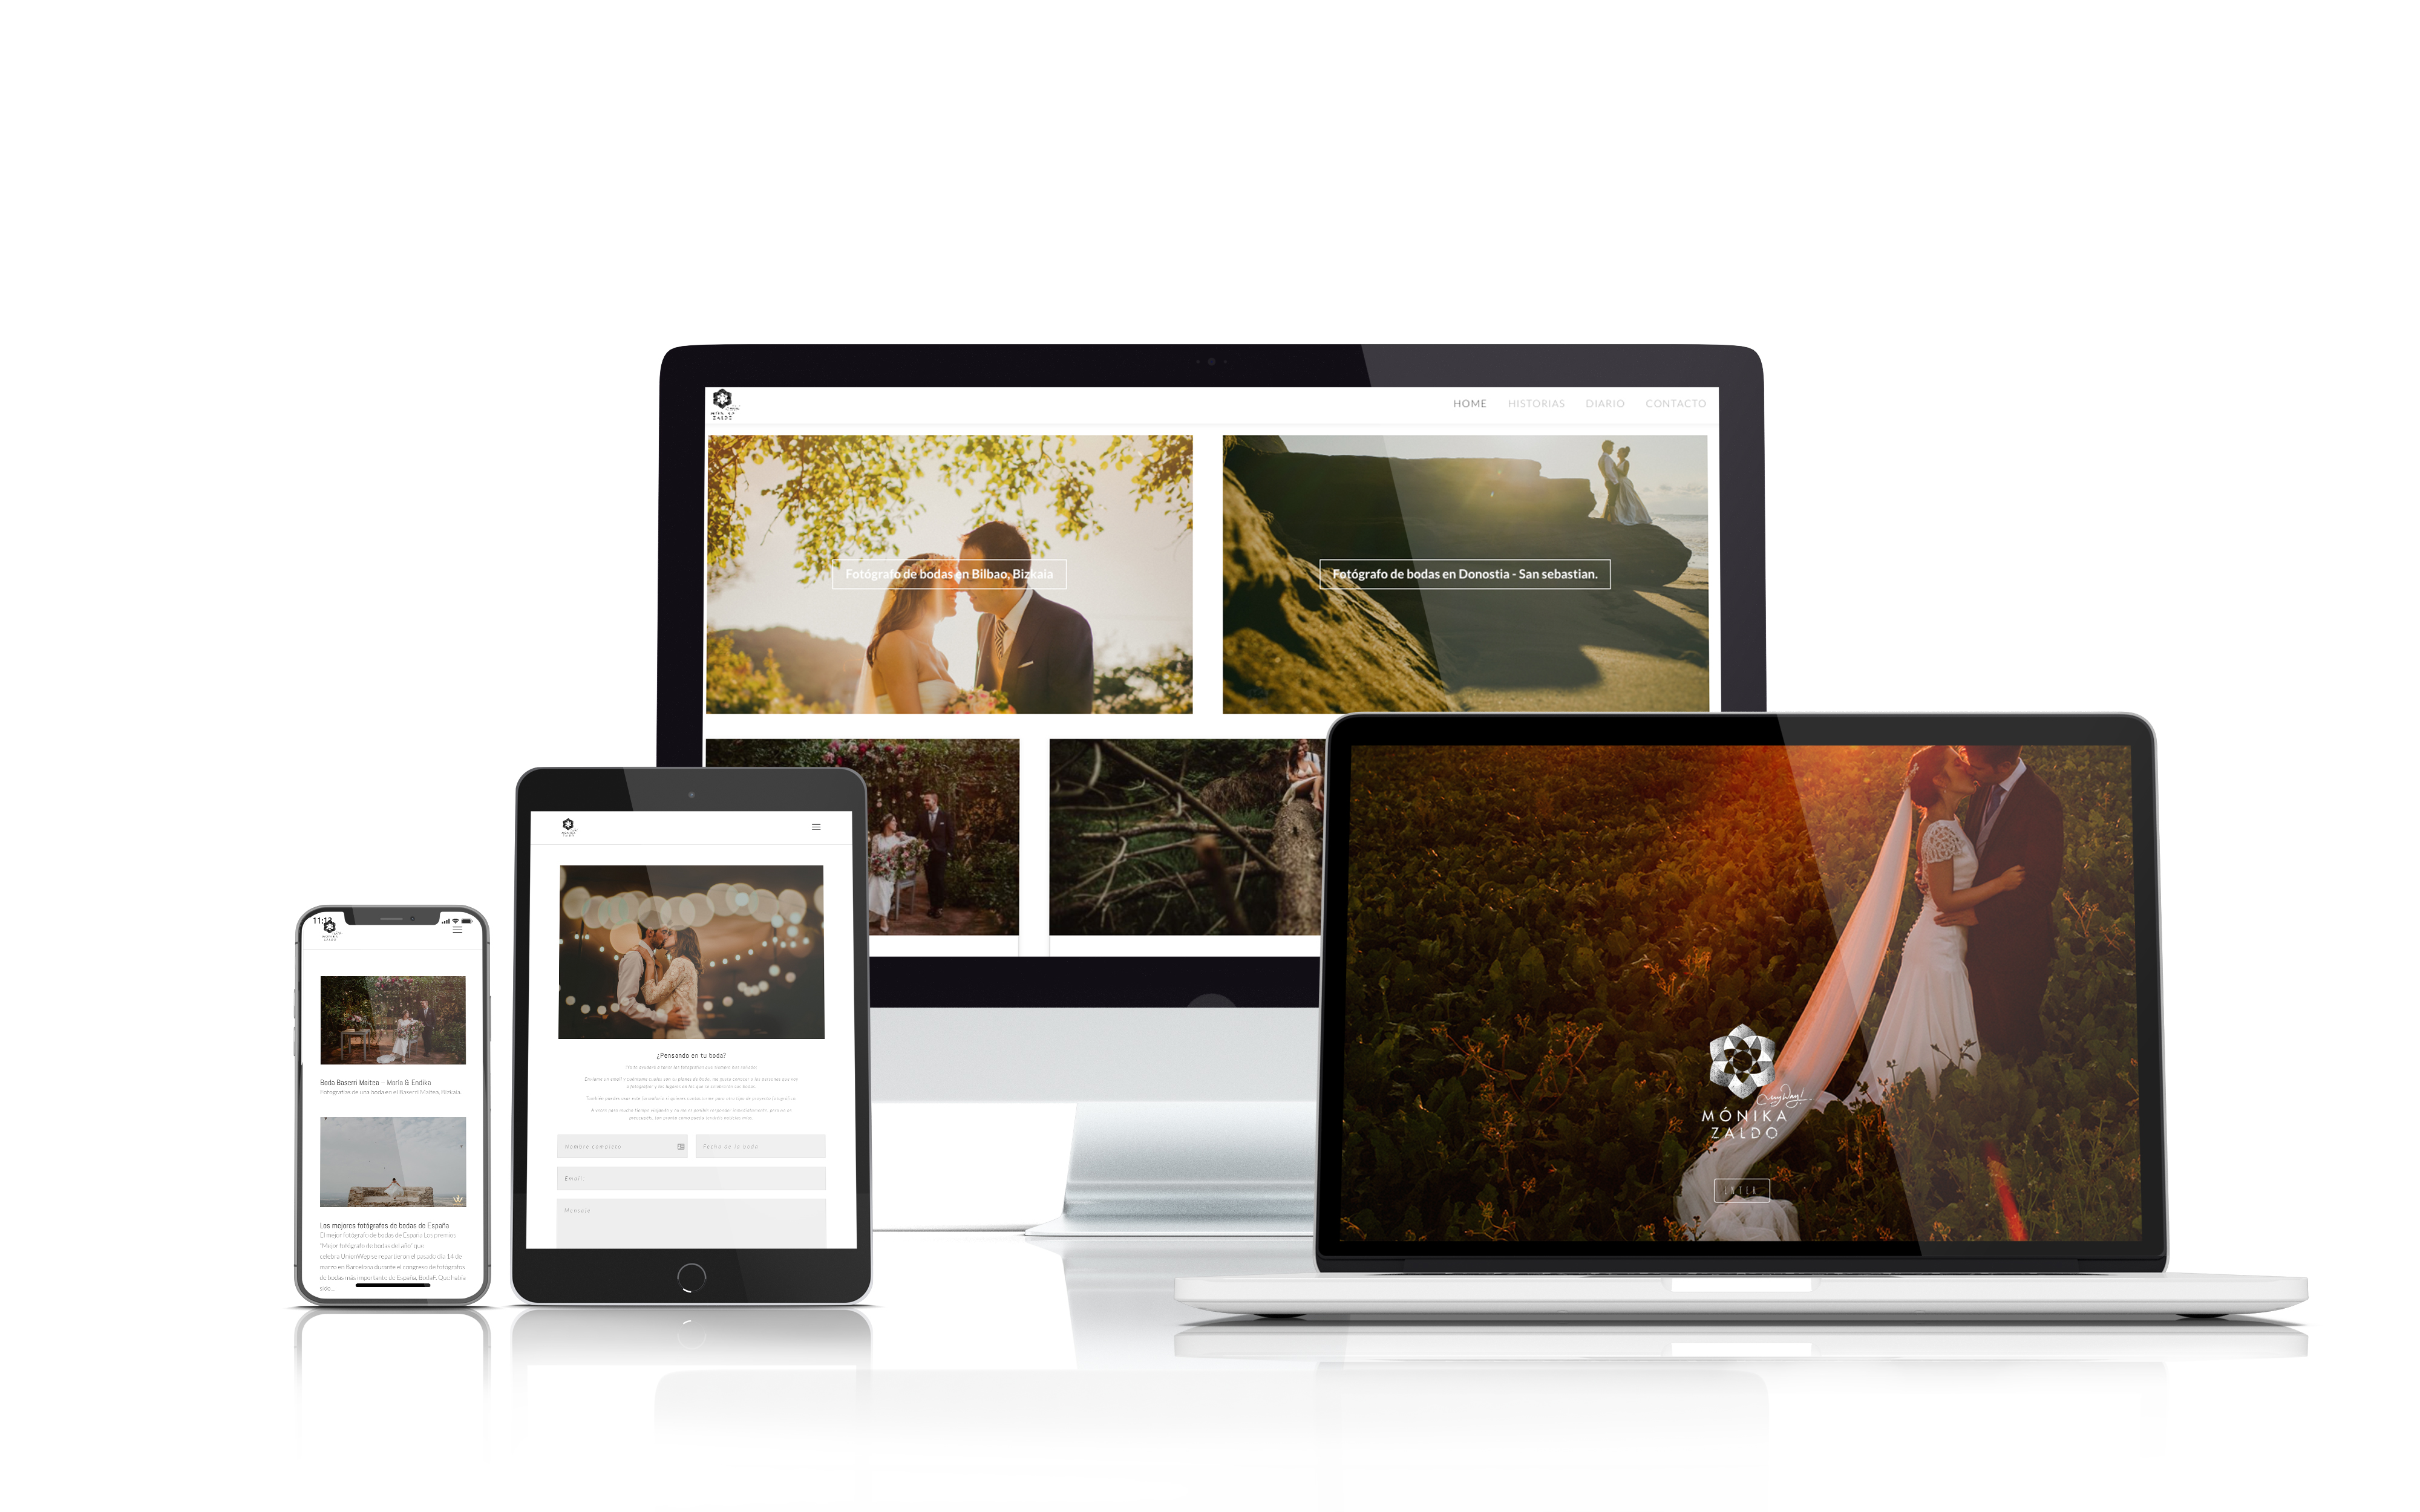 monika-zaldo-mac-webs-para-fotografos